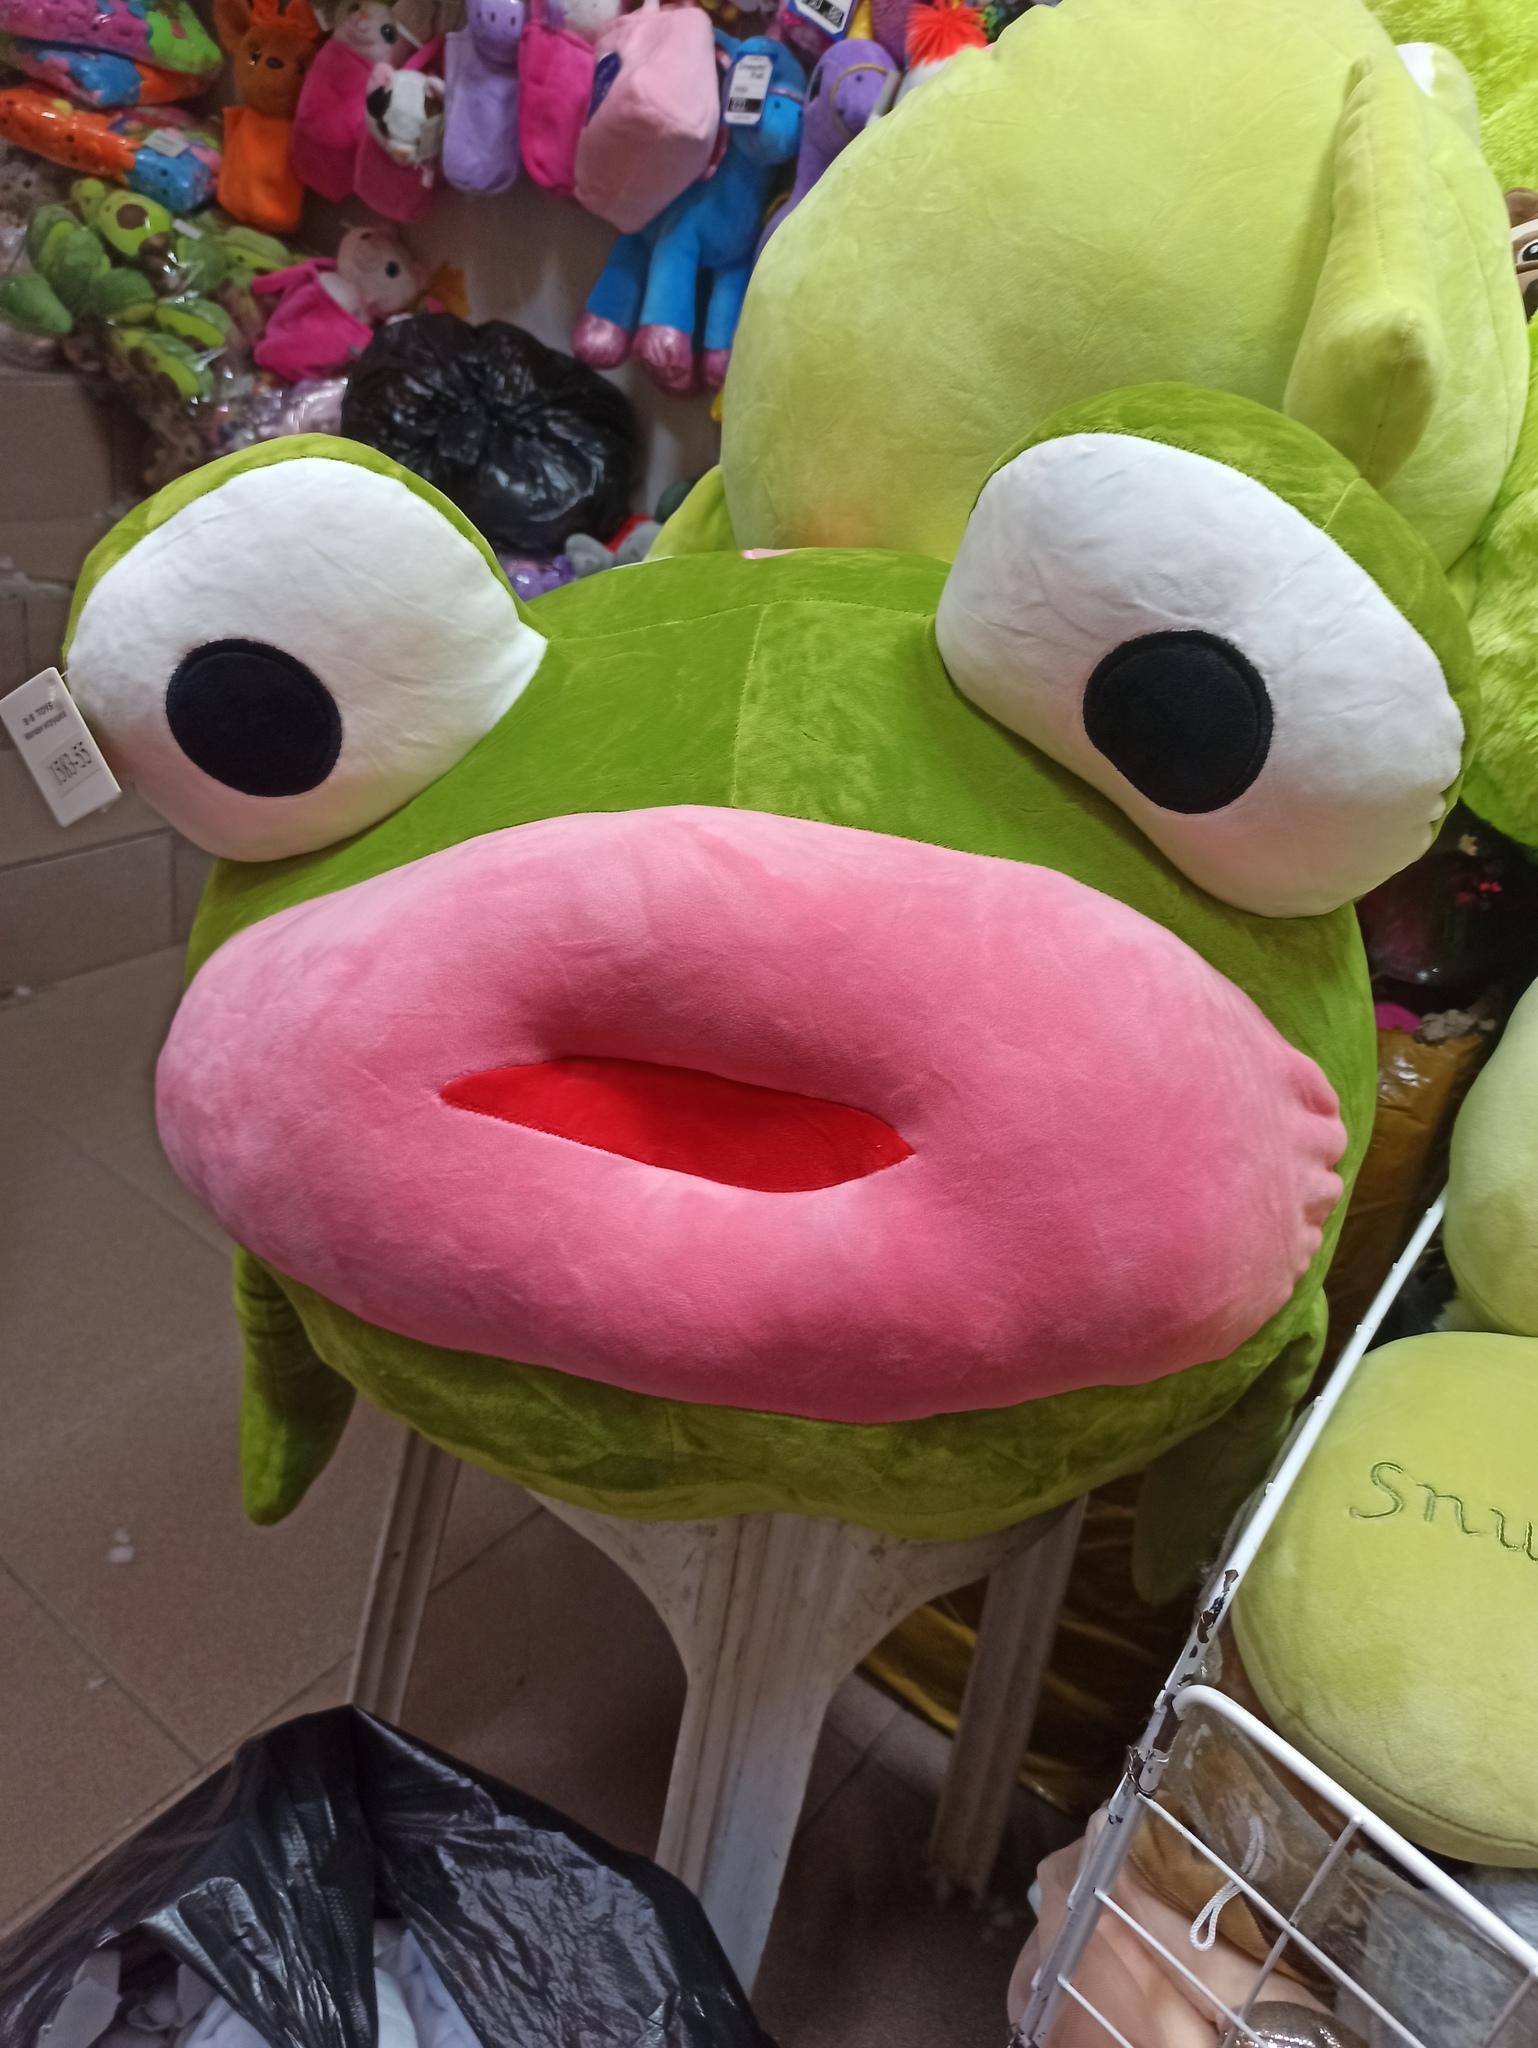 лягушка с большими губами